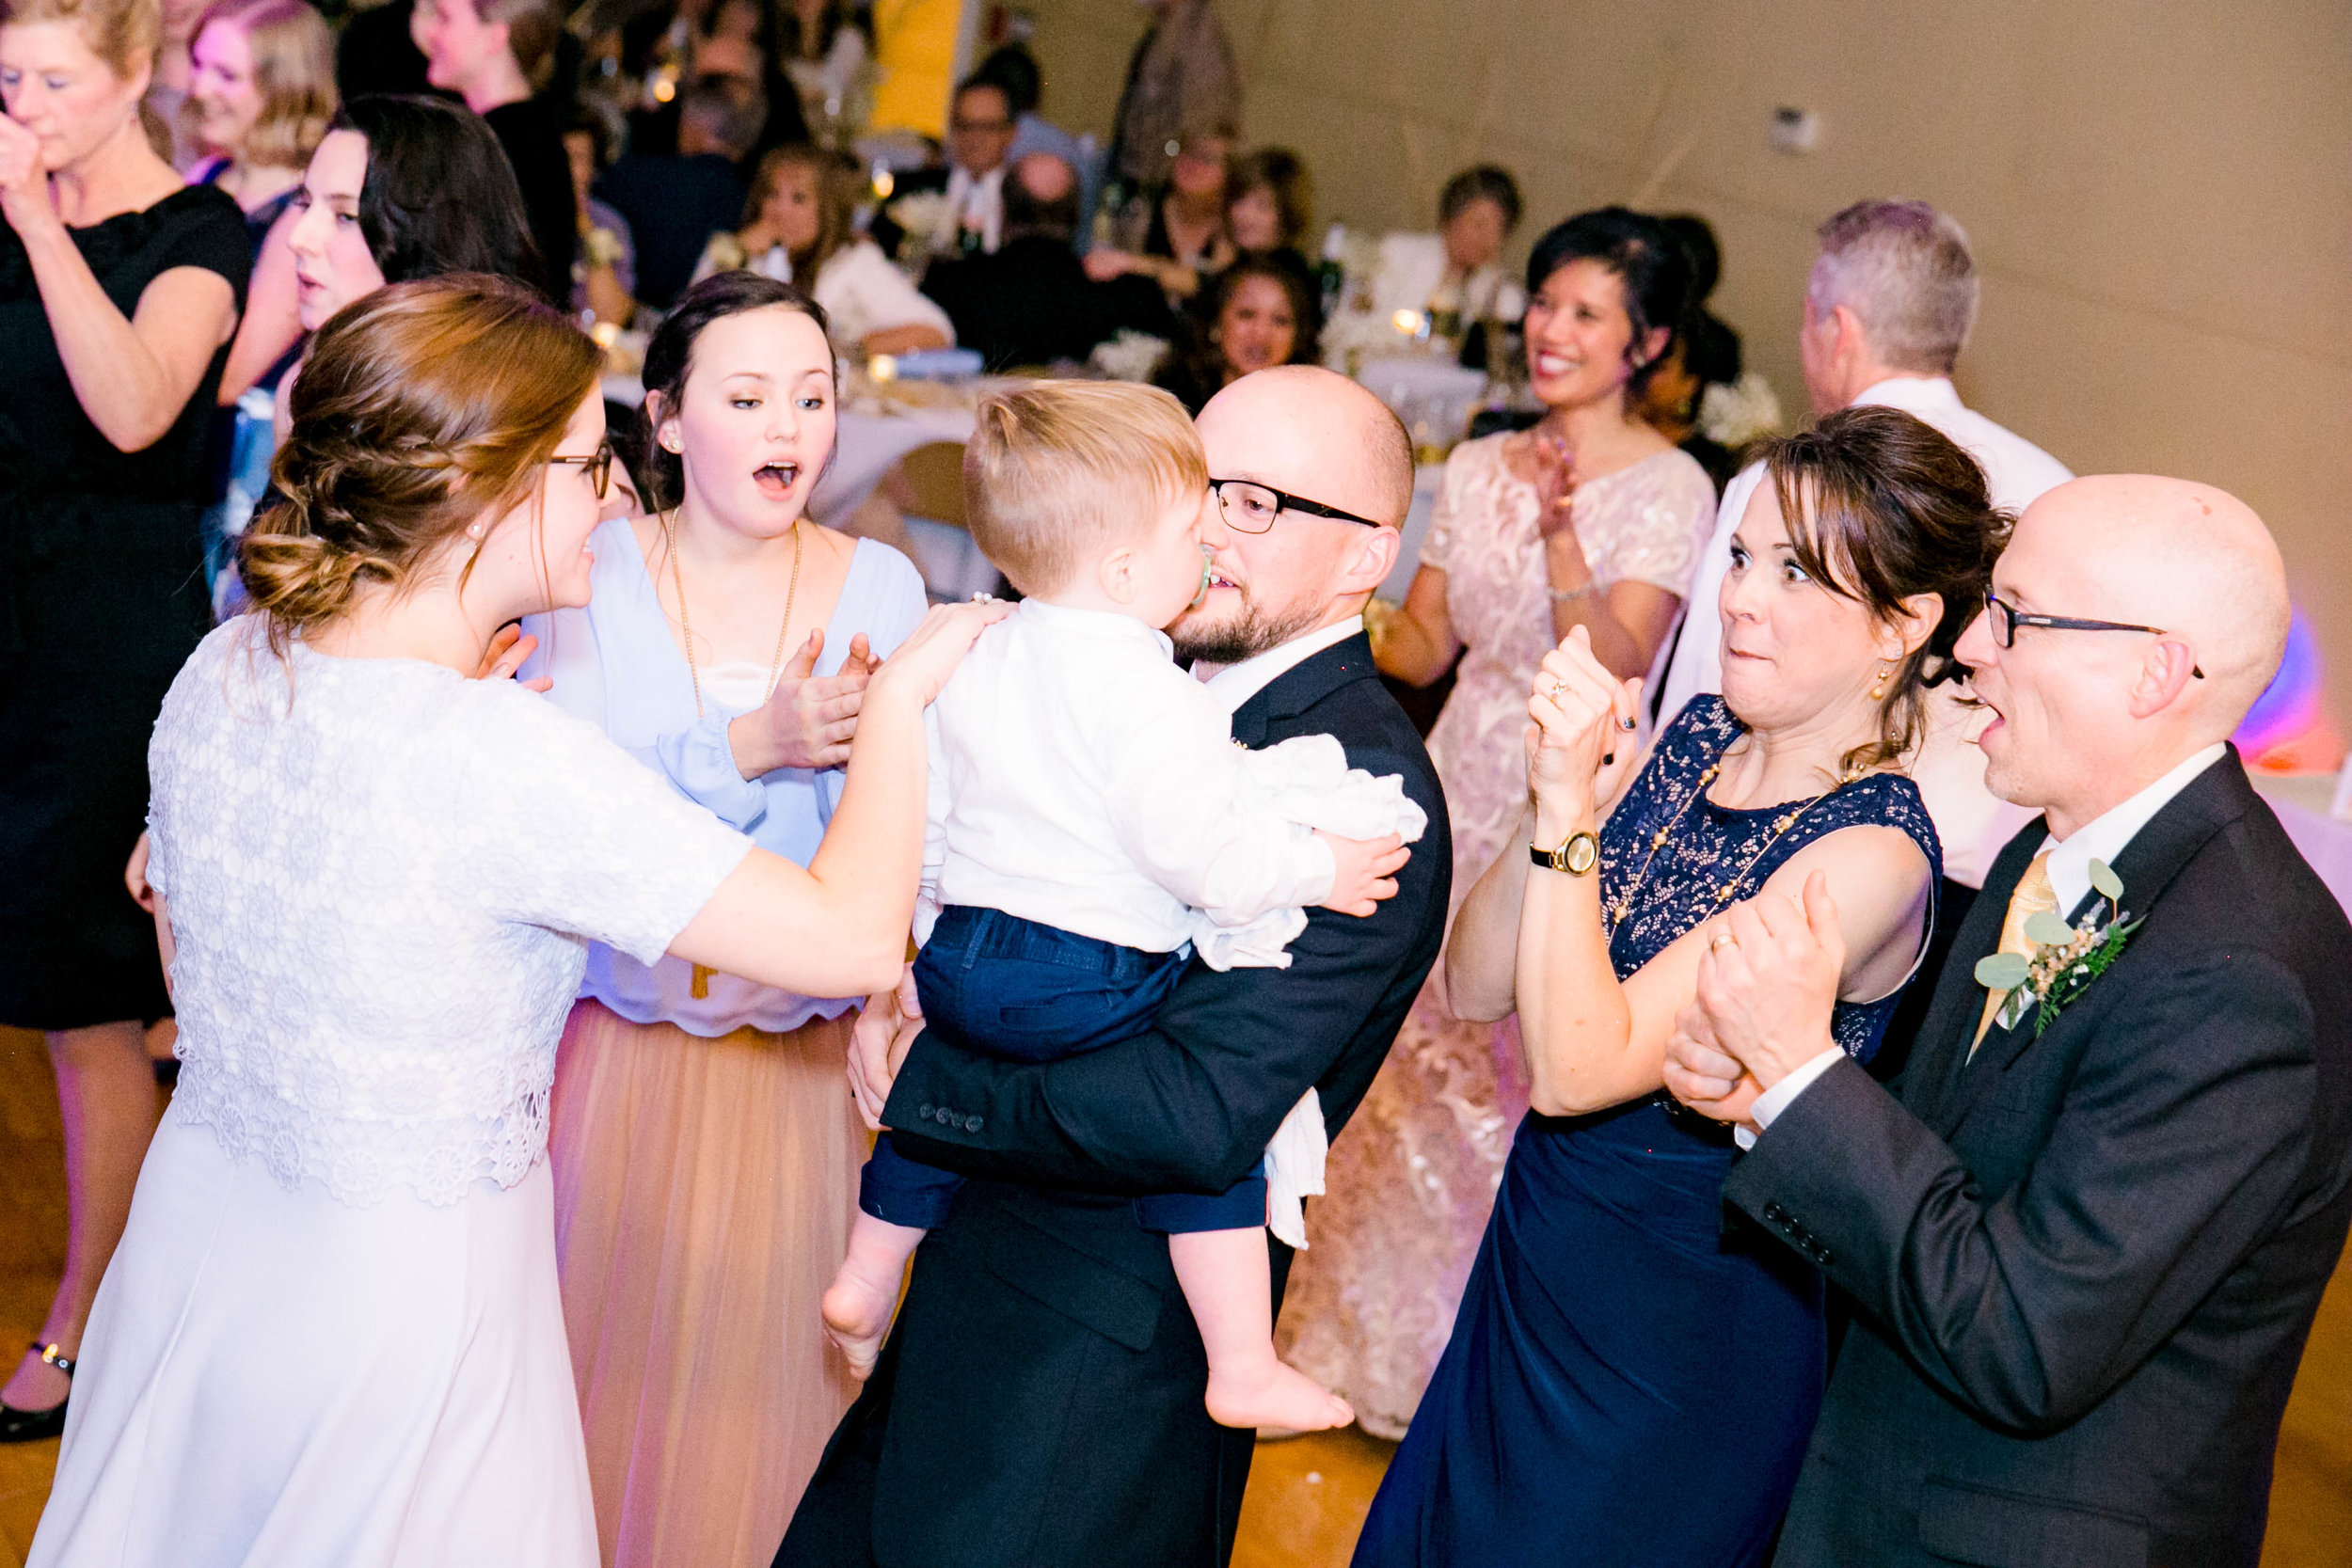 Wedding reception, dancing guests